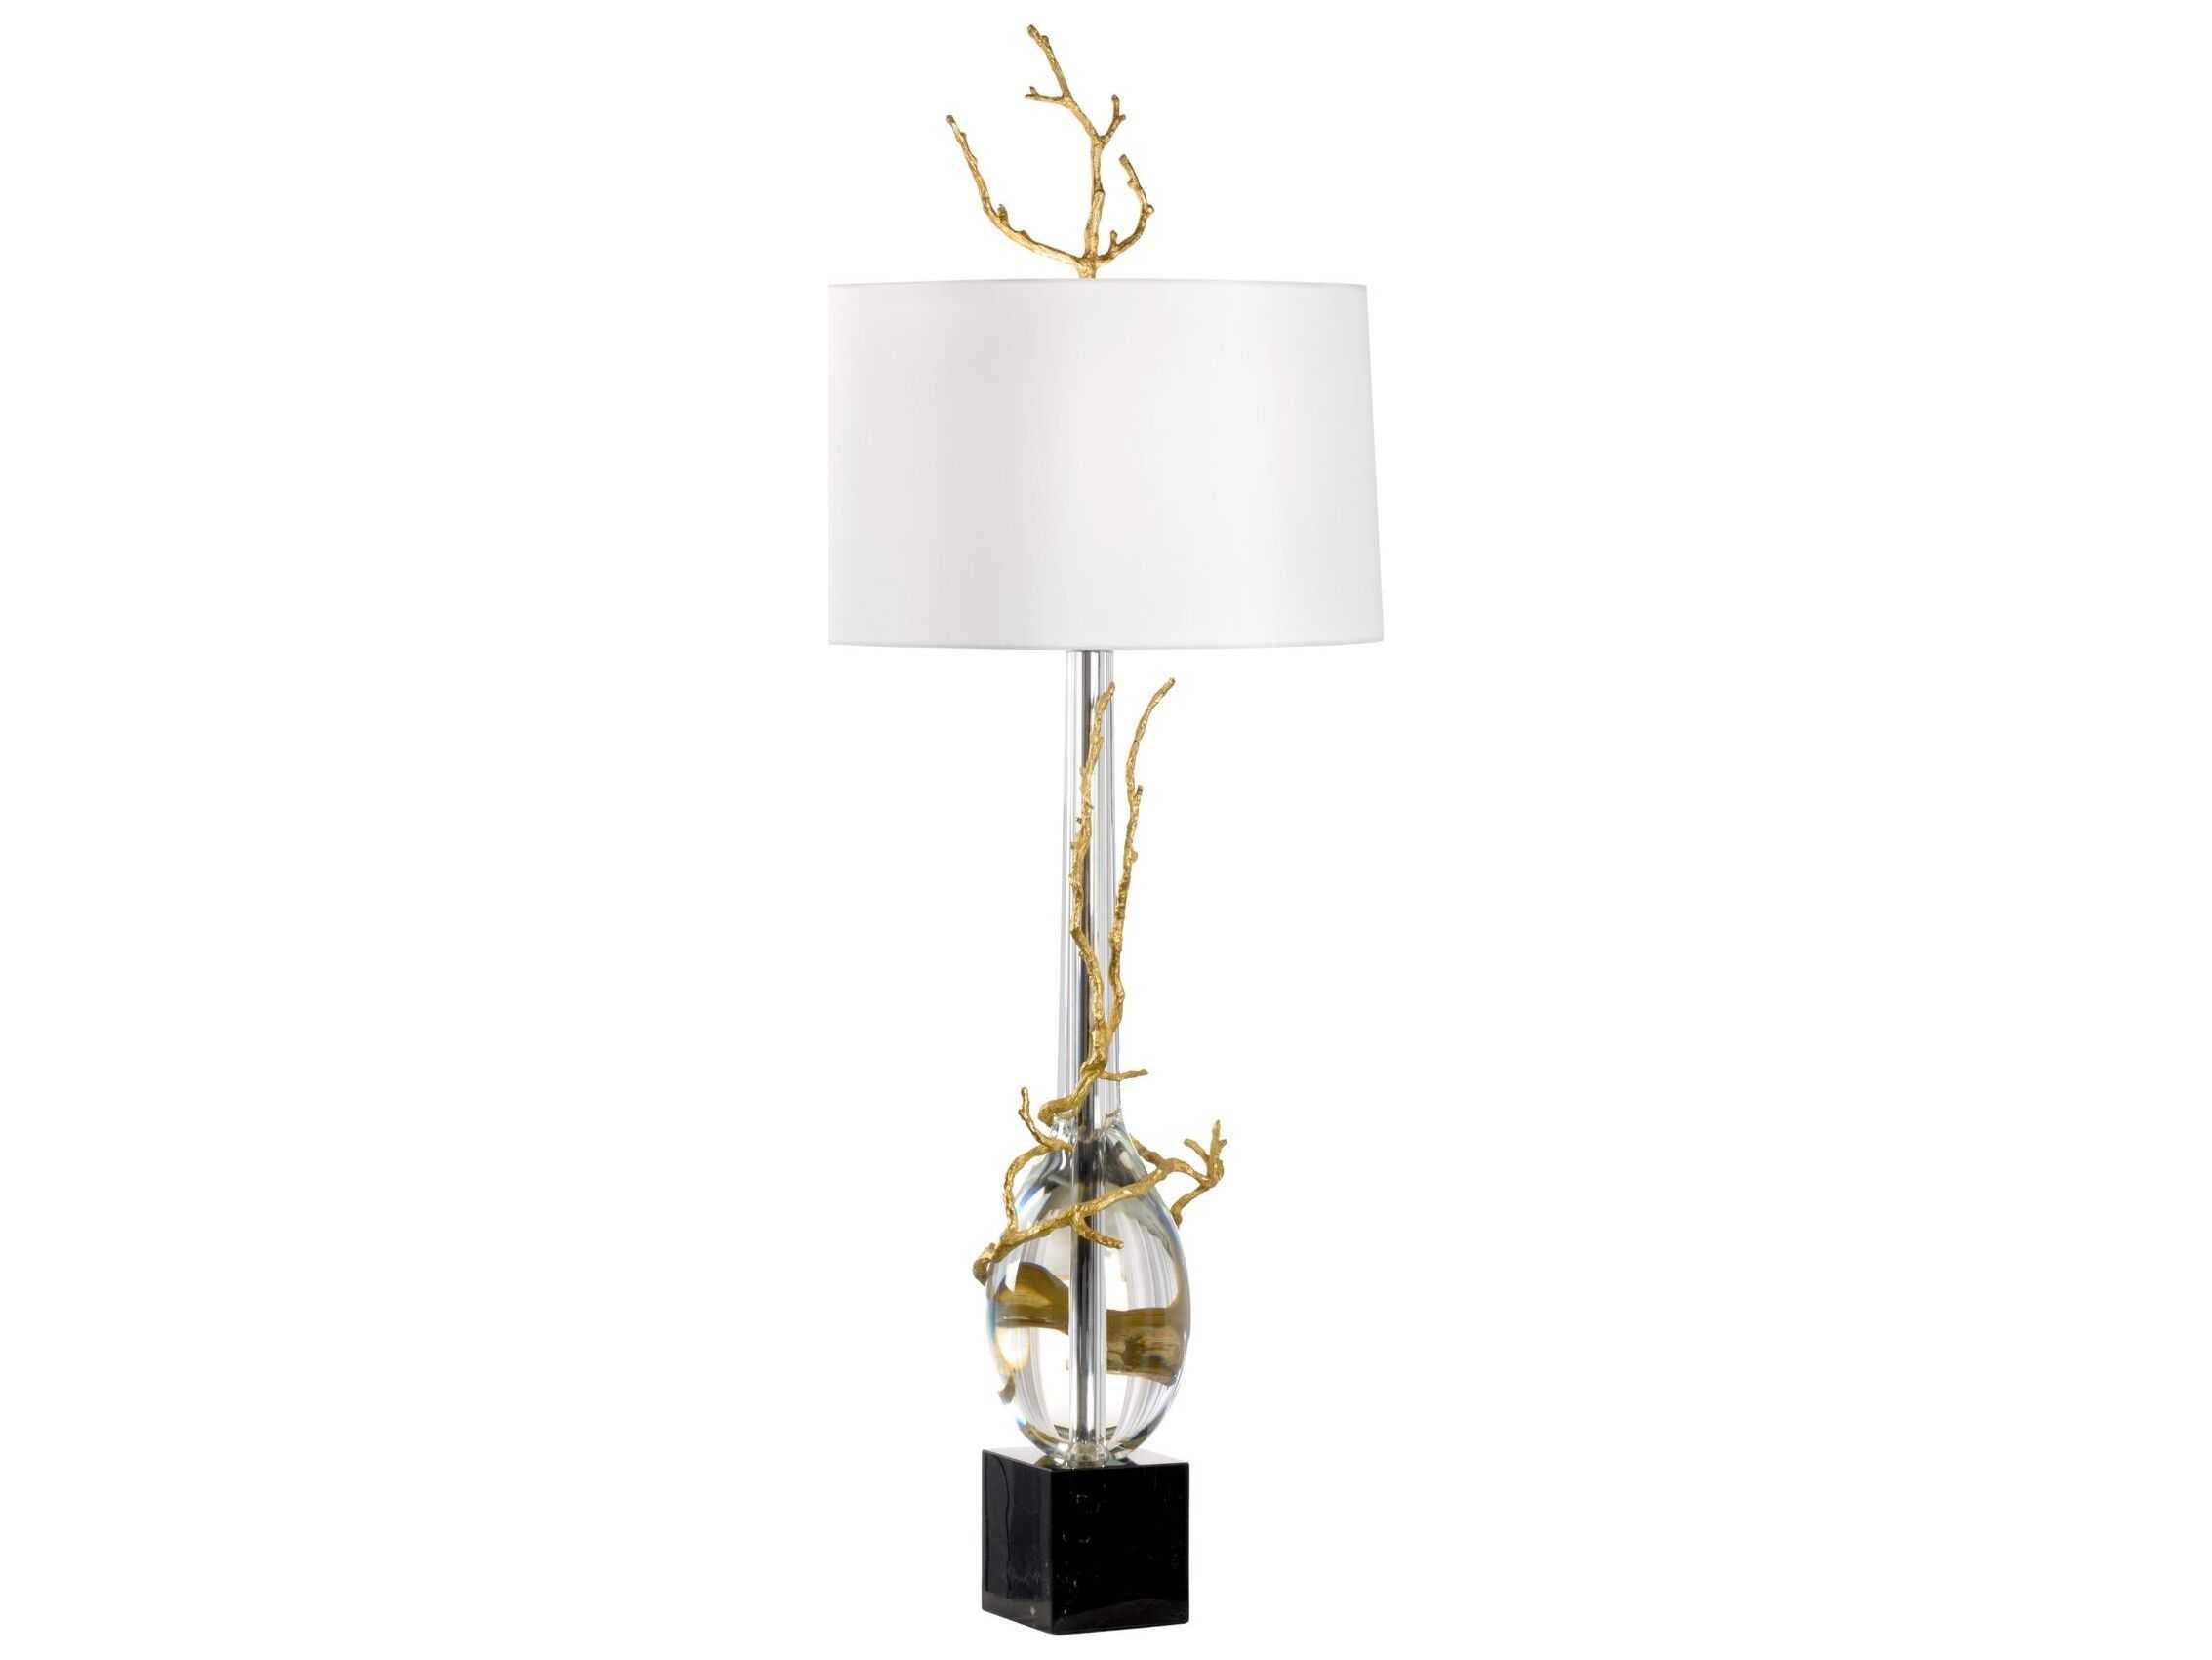 Antique Crystal Floor Lamp